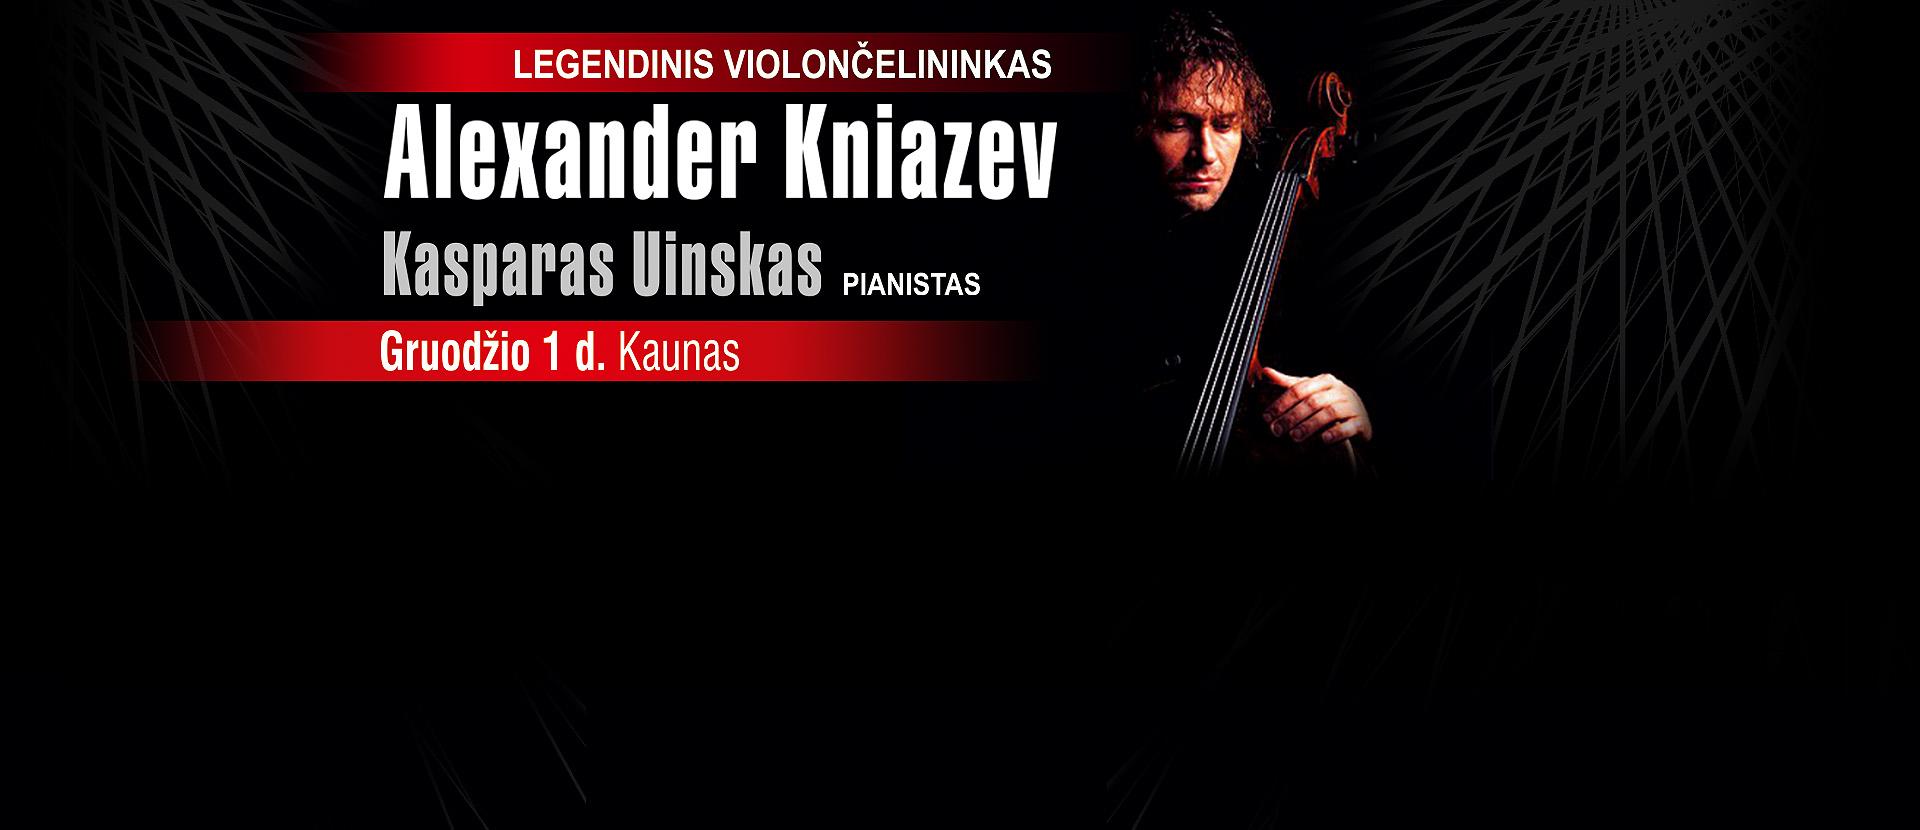 Legendinis violončelininkas Alexander Kniazev